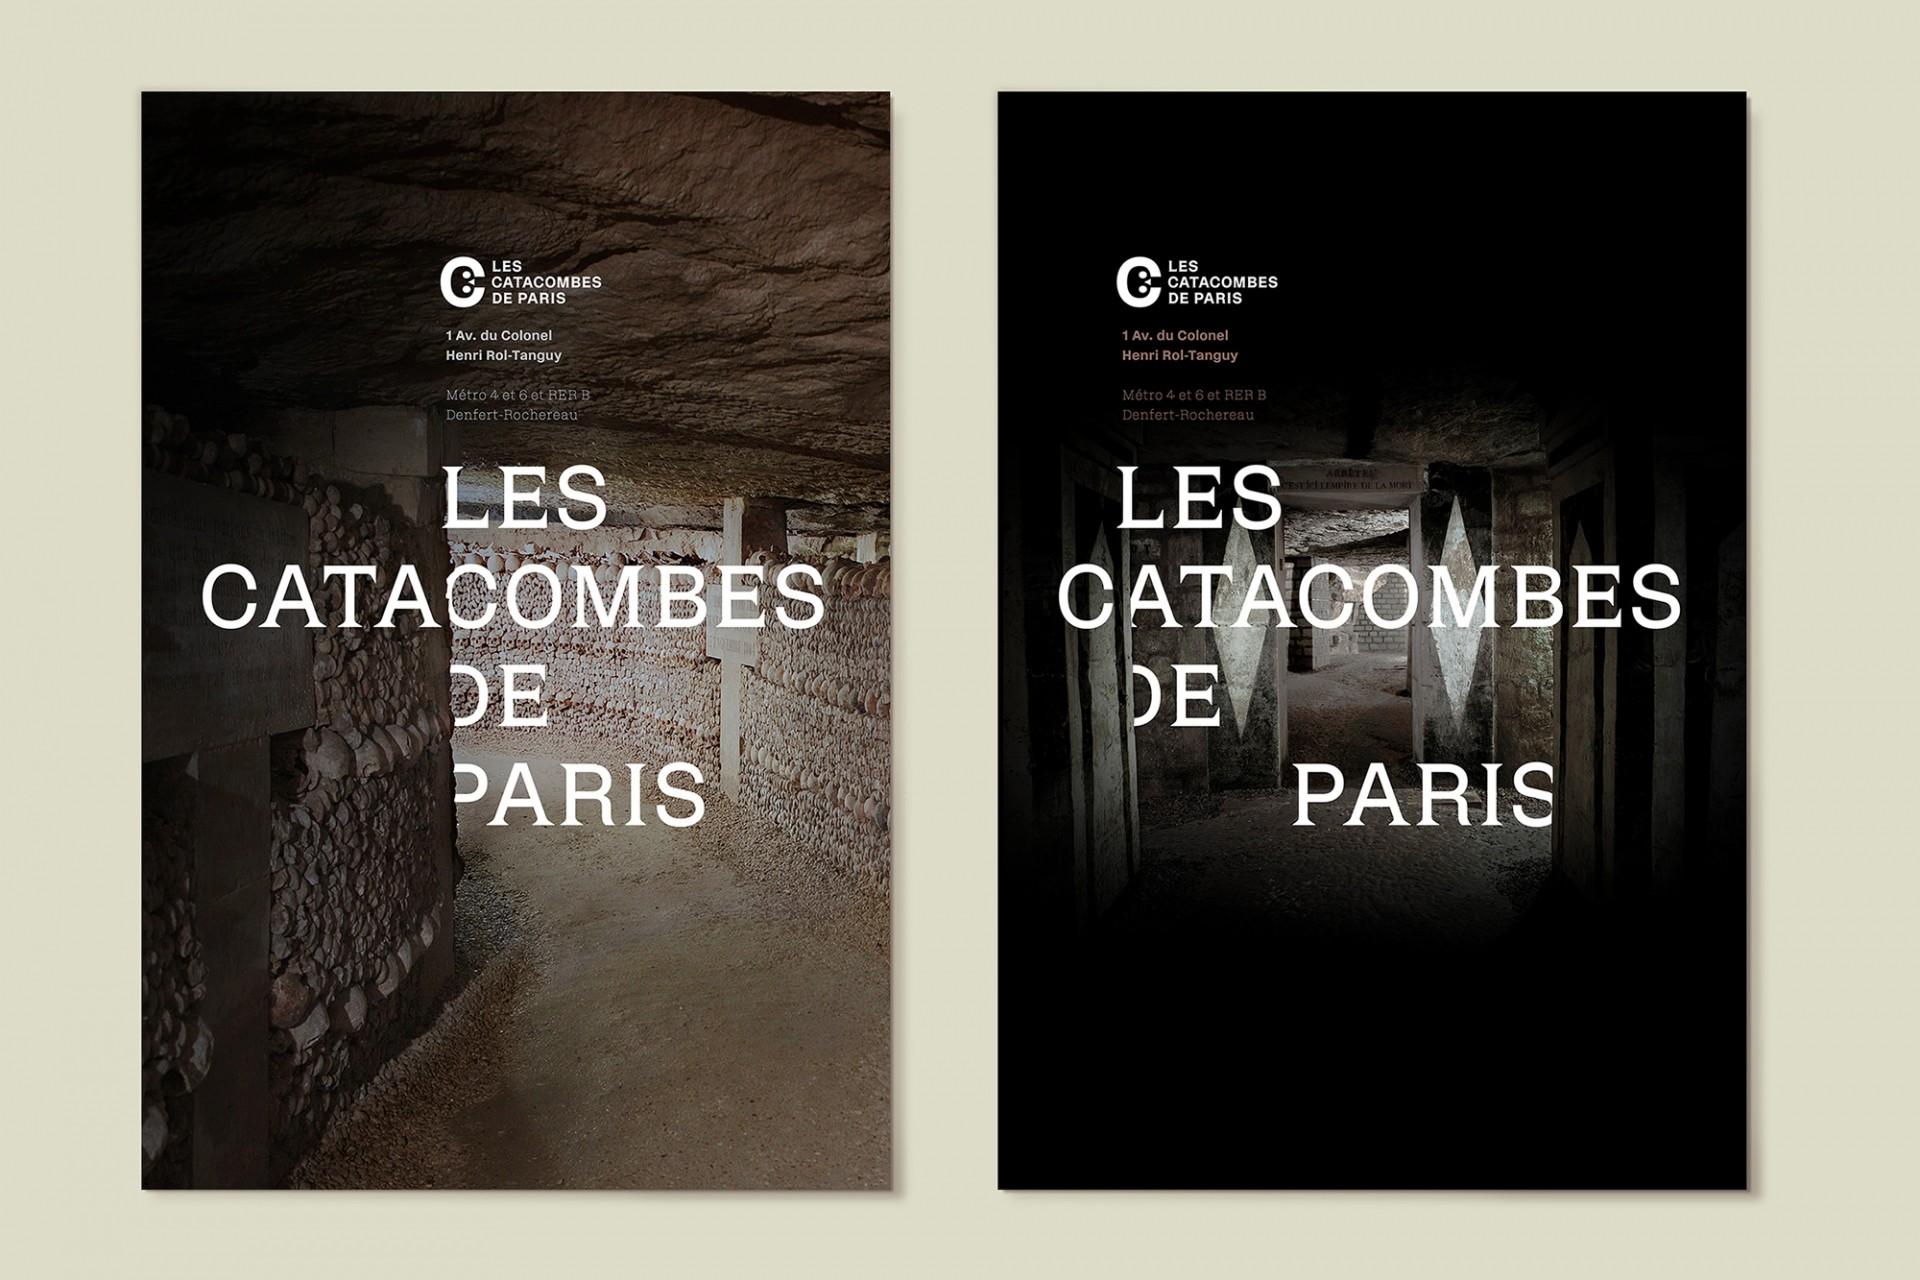 catacombes_005.jpg